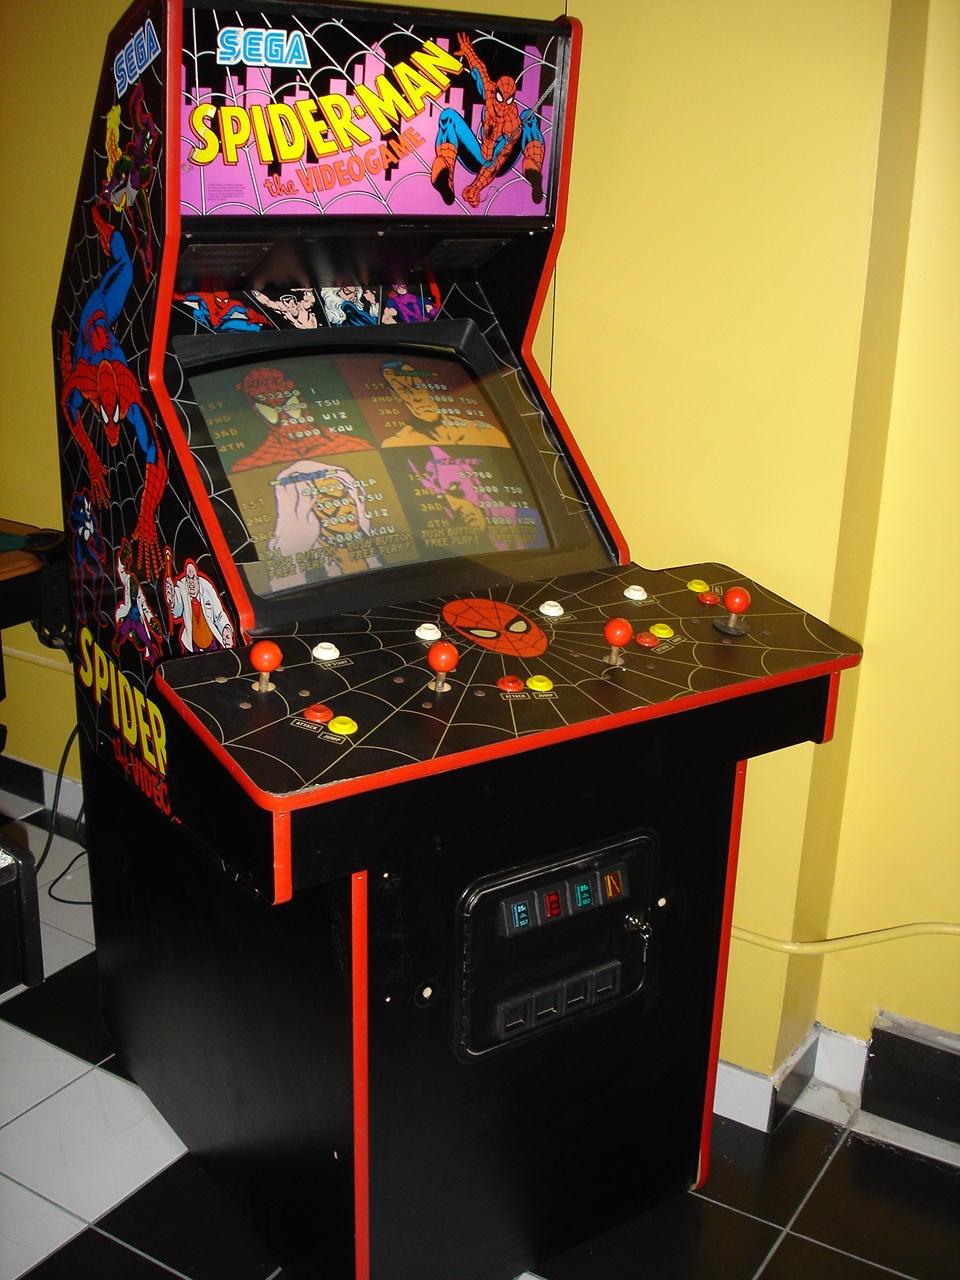 ... Spider Man: The Video Game   Arcade   Cabinet ...